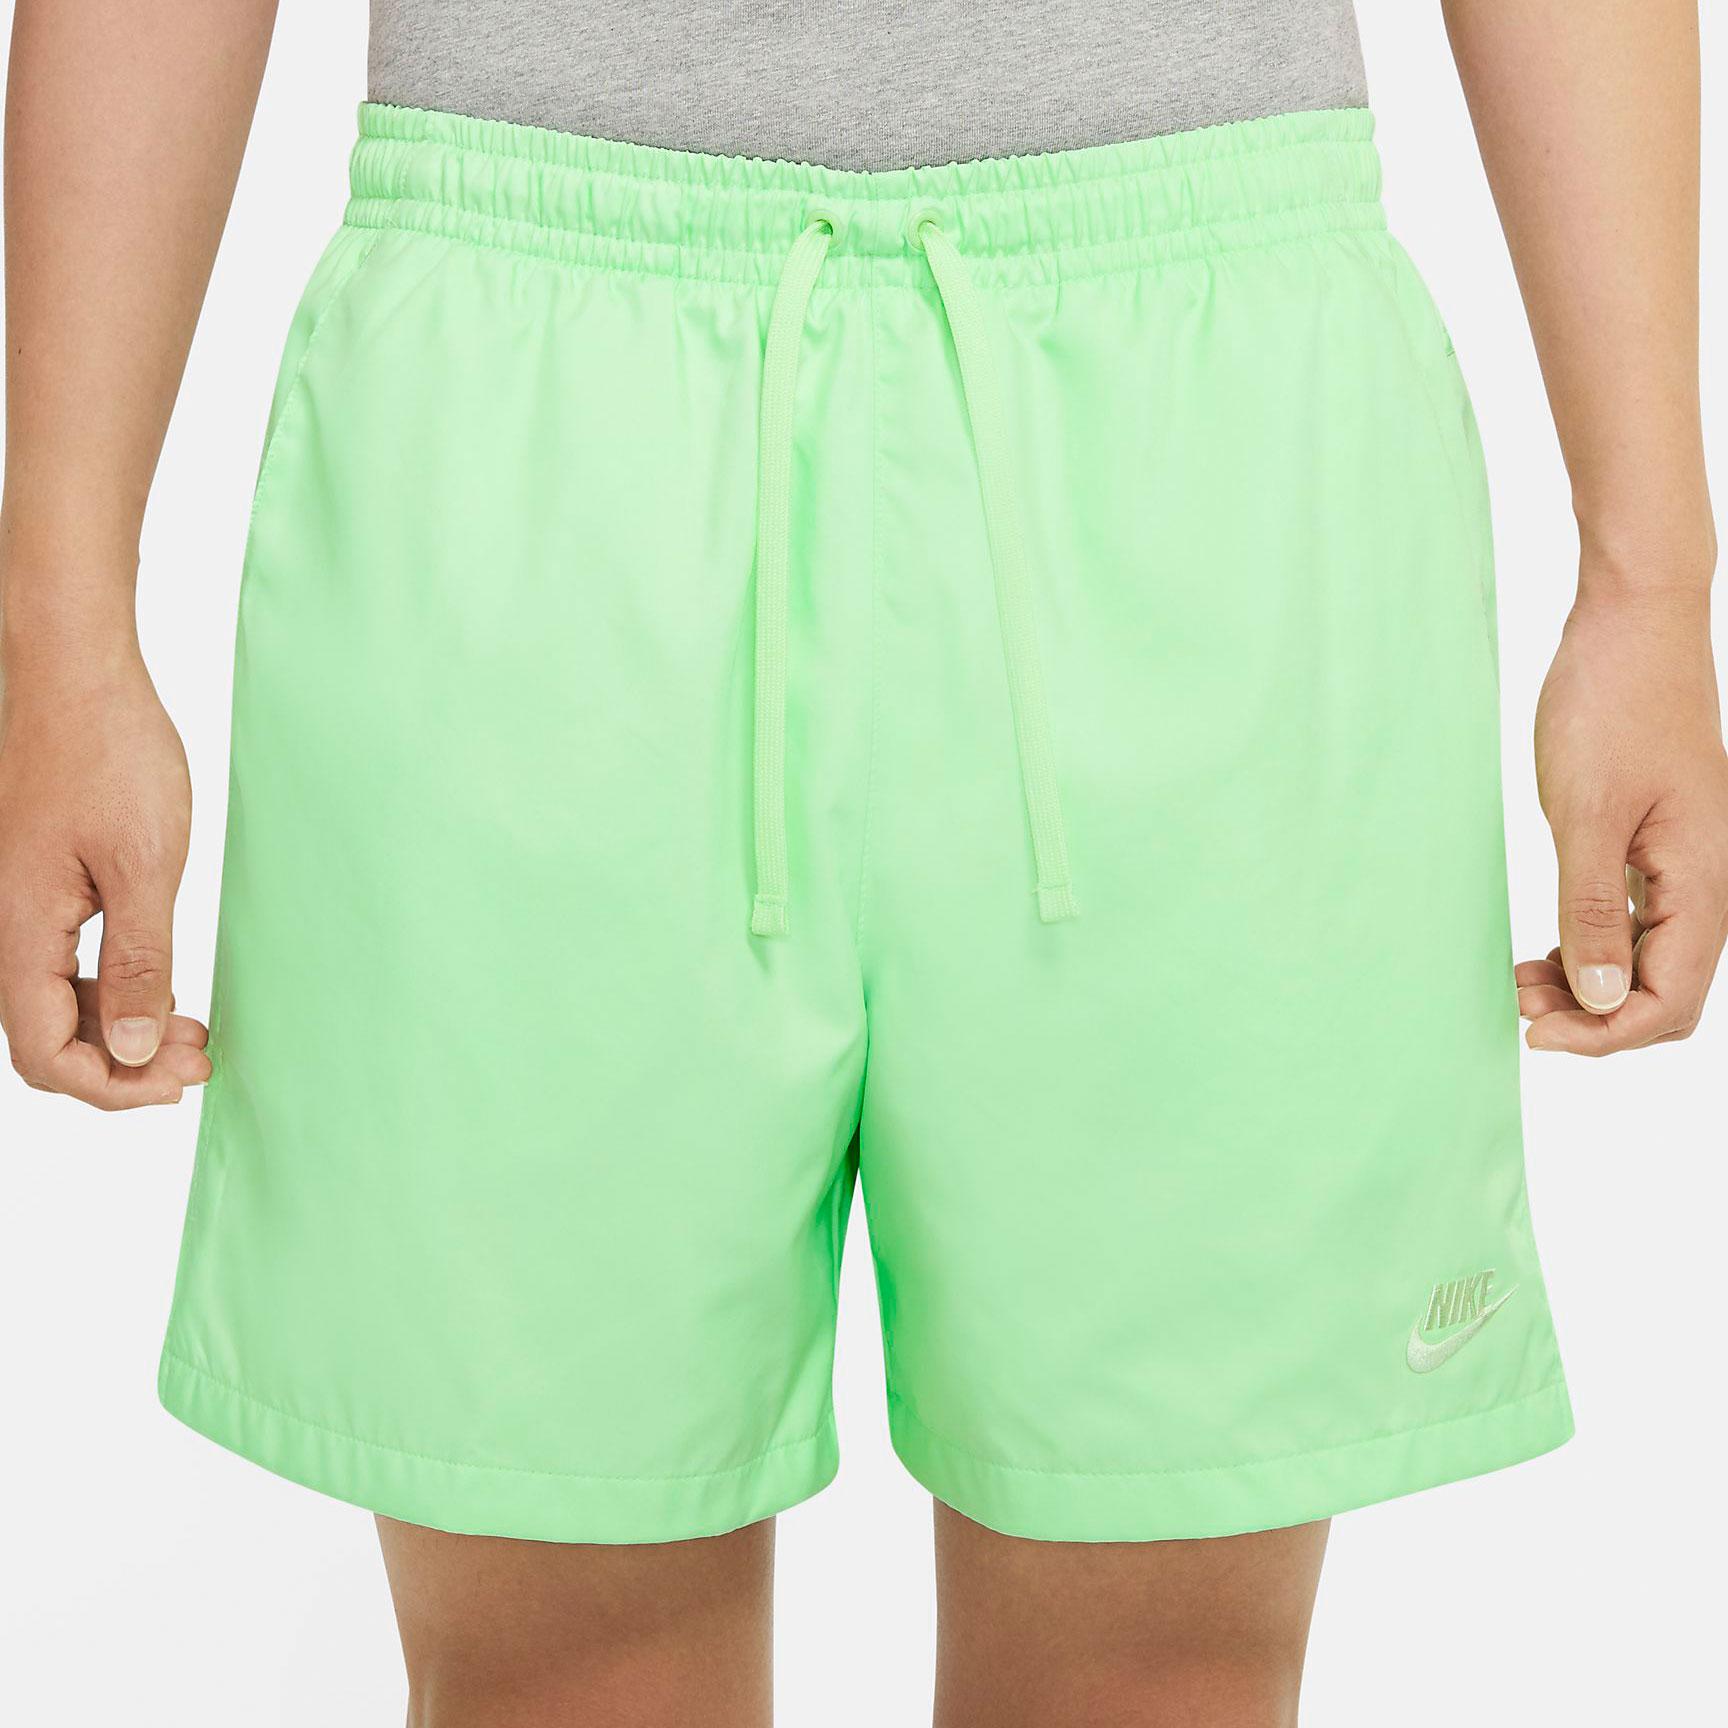 nike-pg-4-gatorade-white-gx-shorts-match